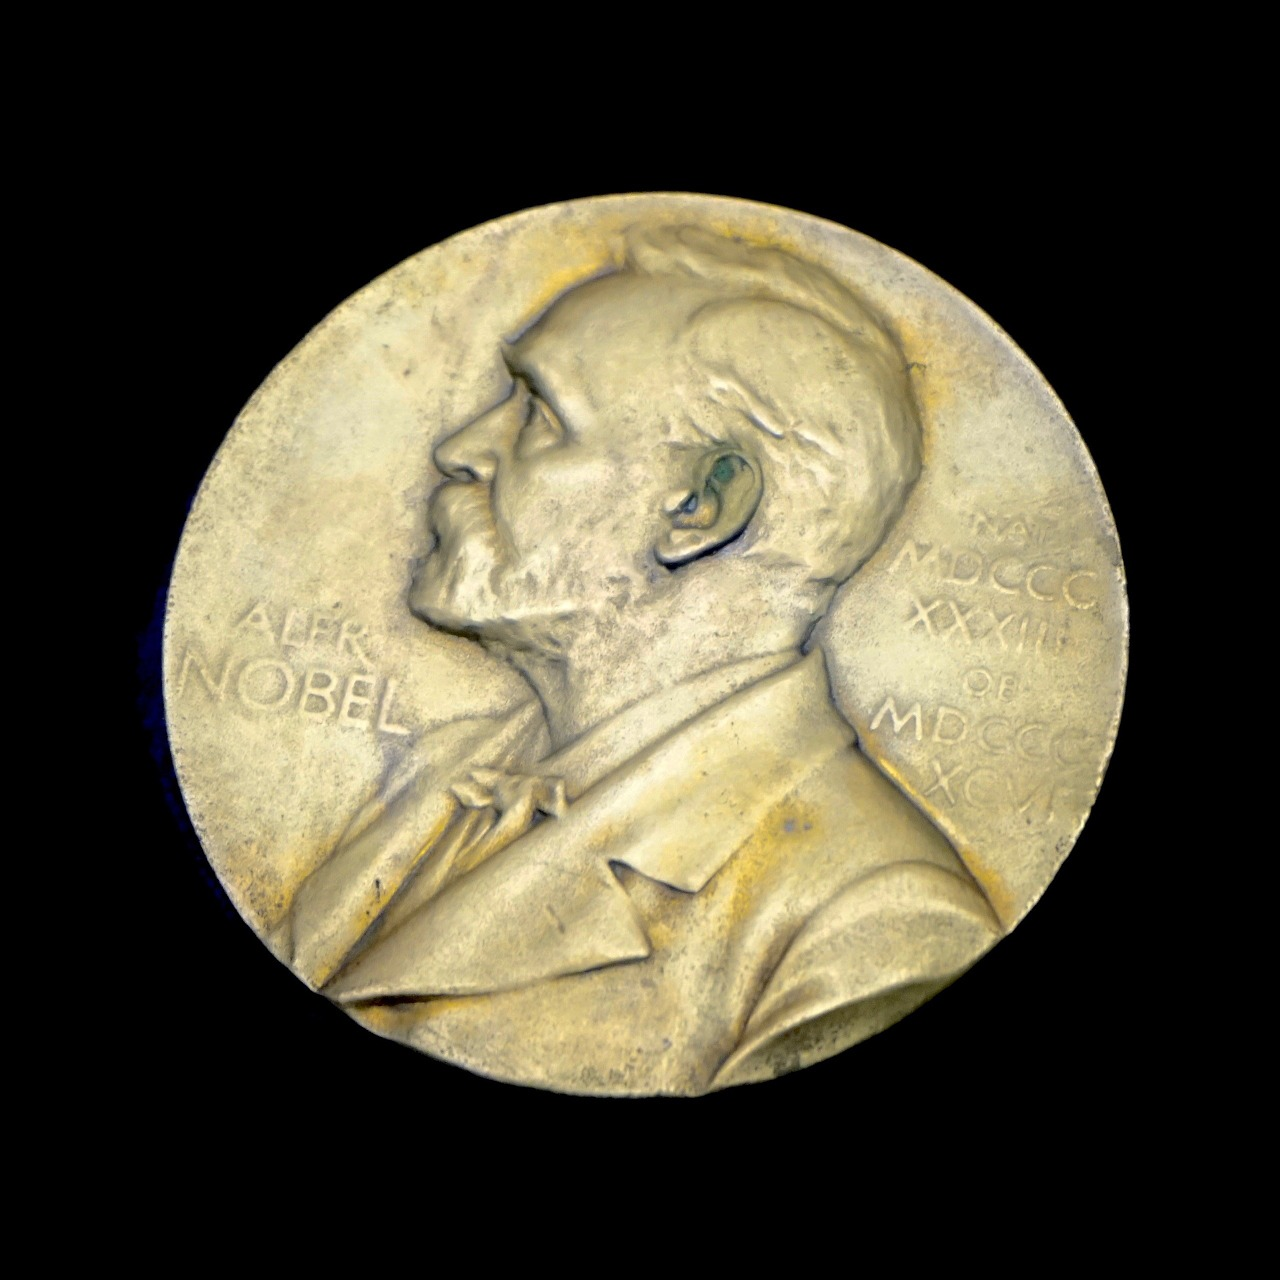 Physik Nobelpreis 2018